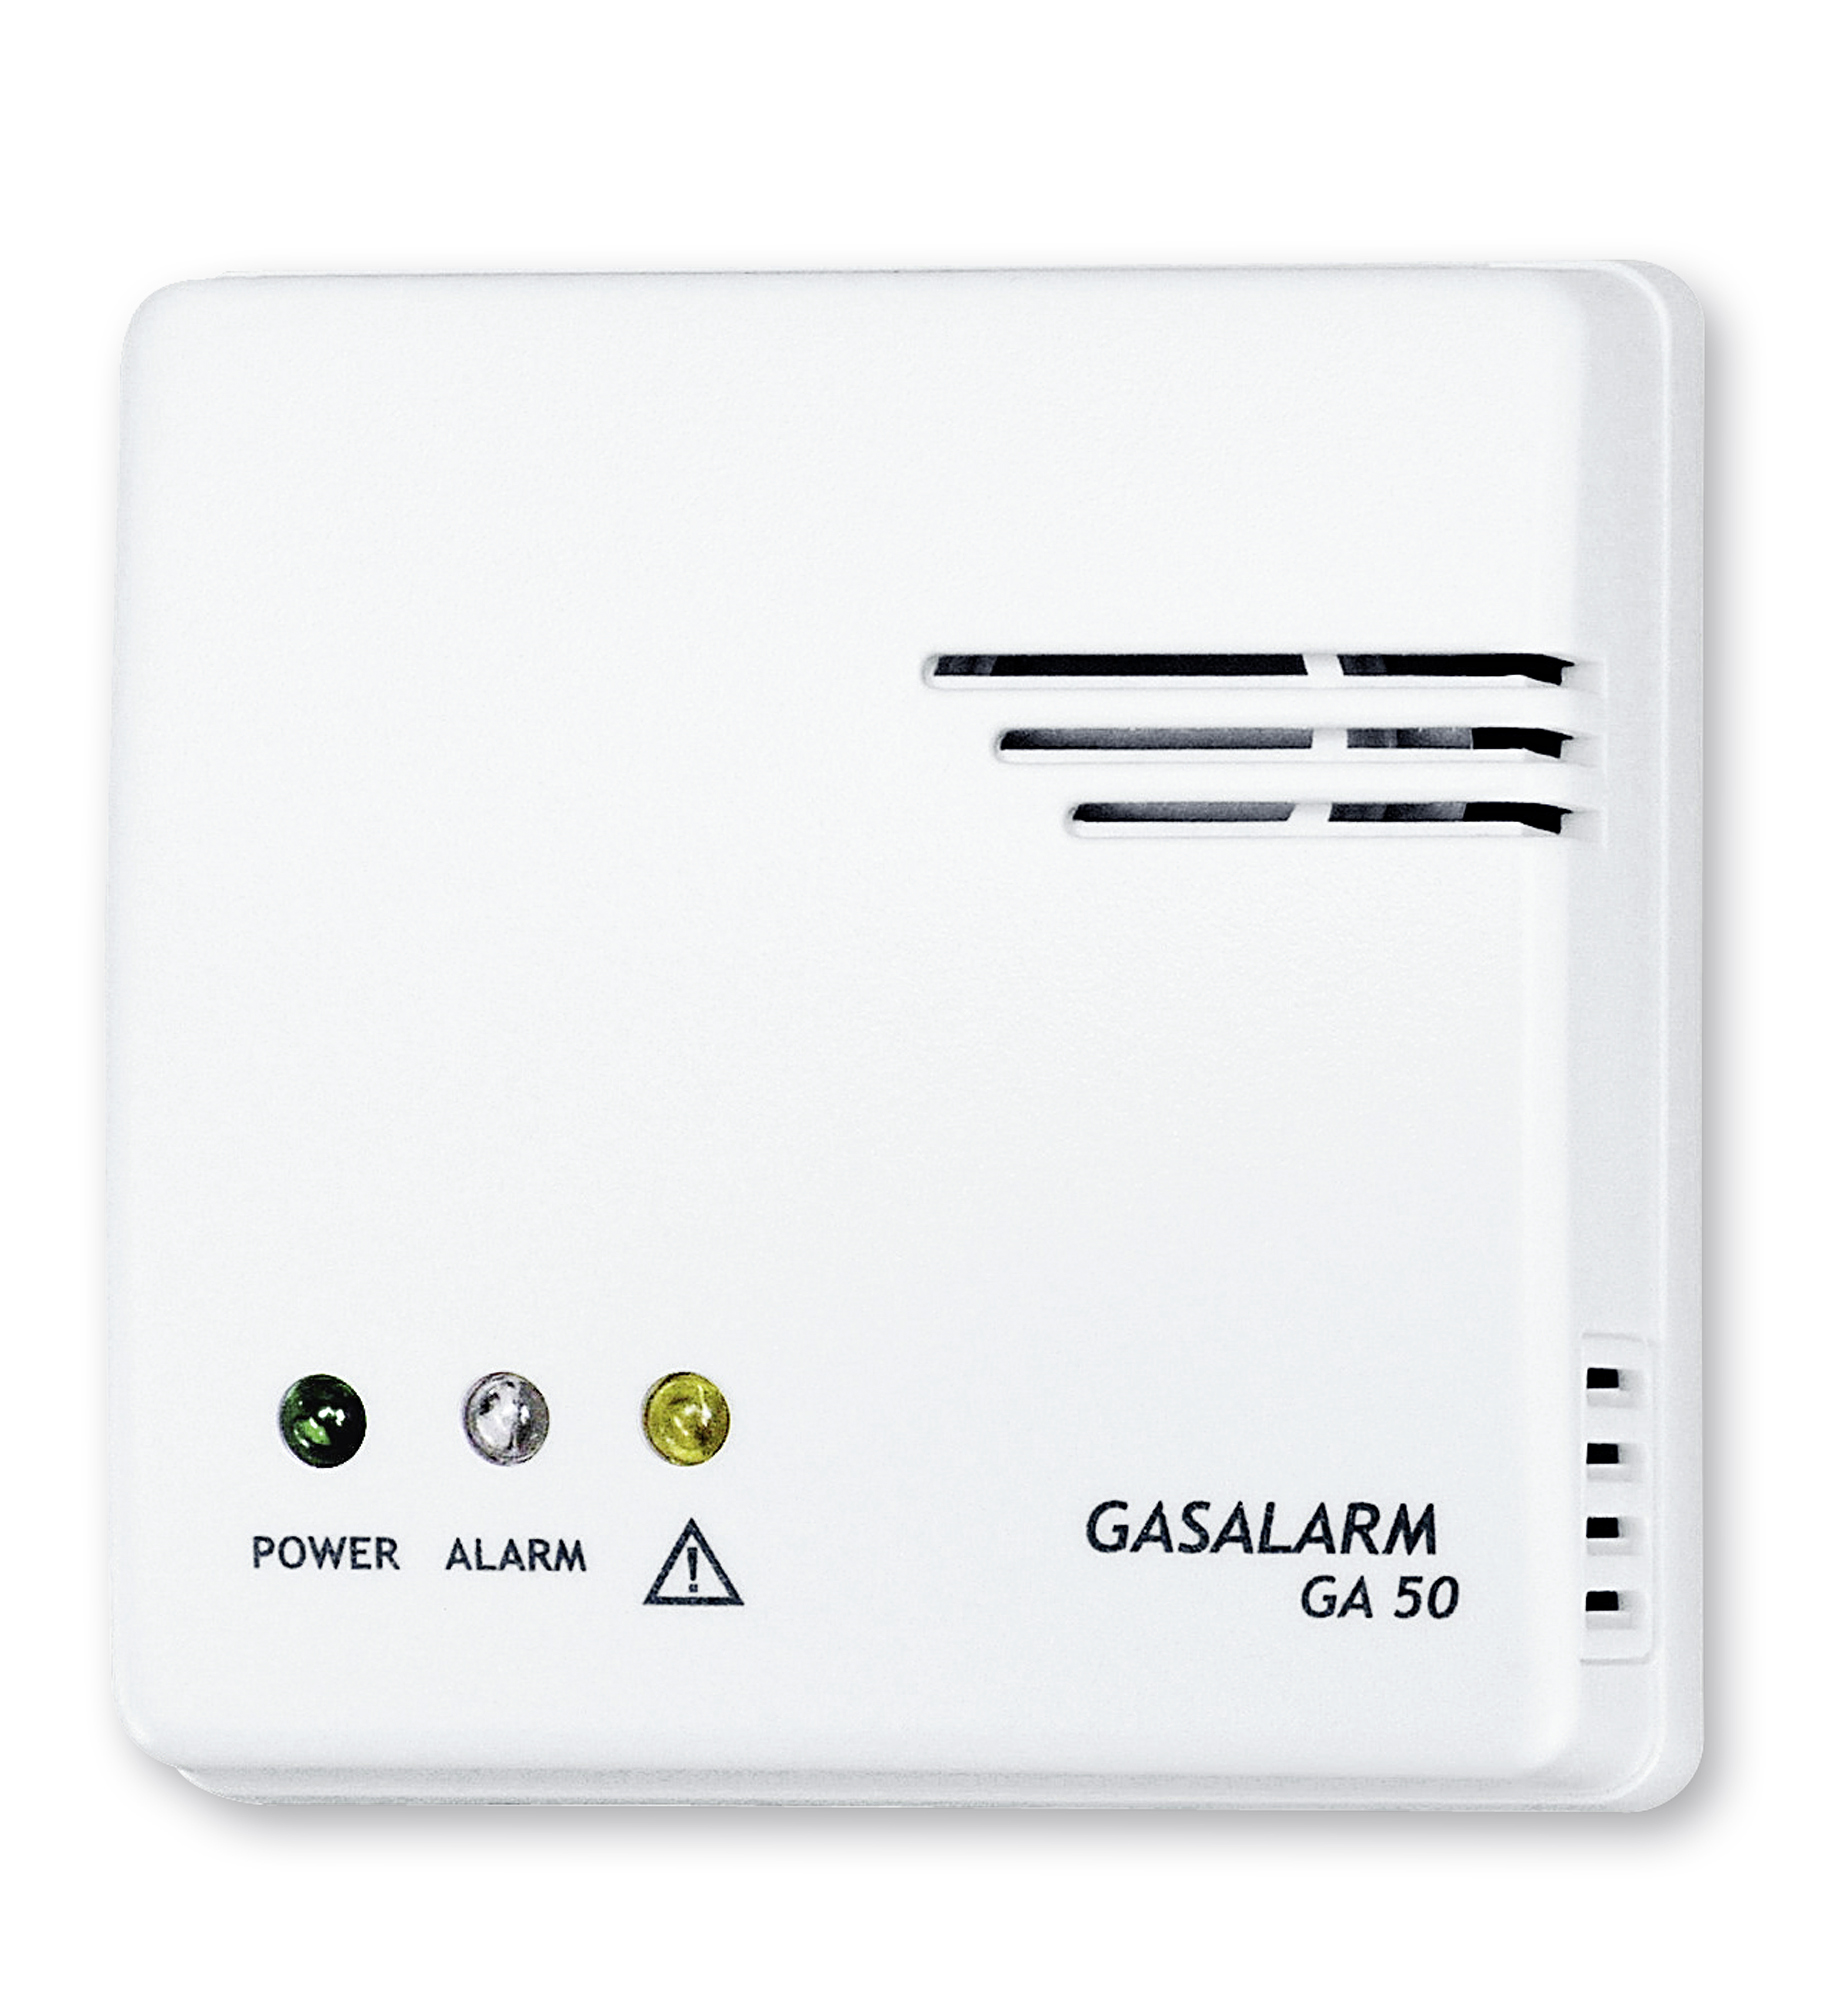 Gasalarmmelder 12 V mit Netzteil 230 V